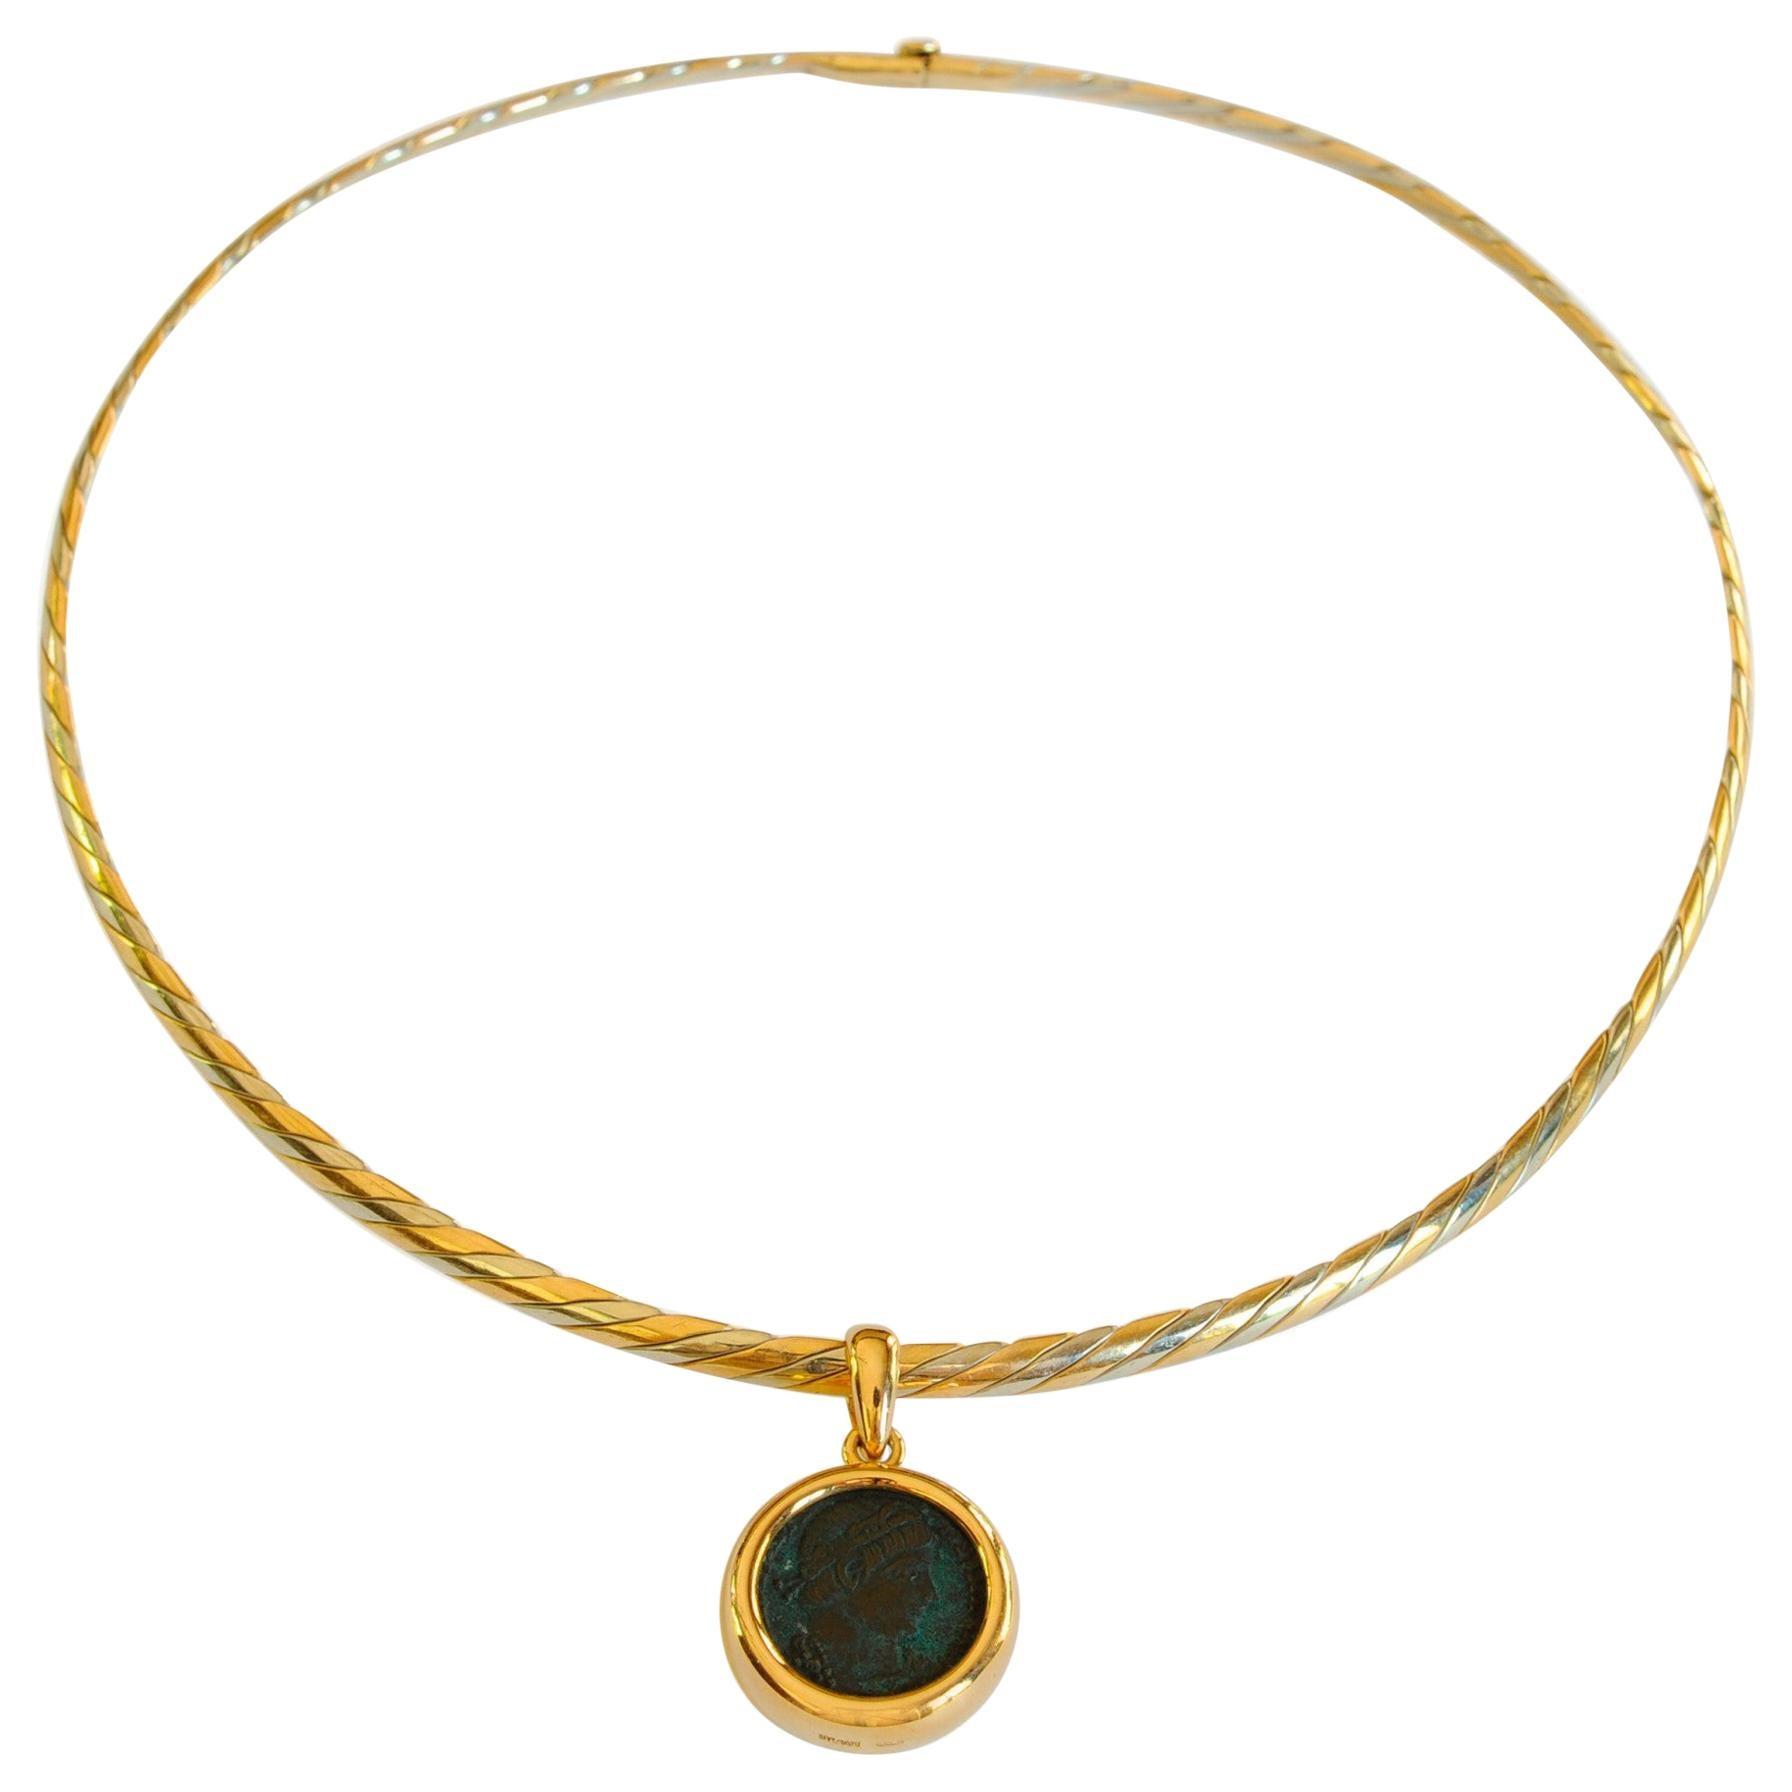 Bulgari Monete Ancient Roman Coin Braided Necklace